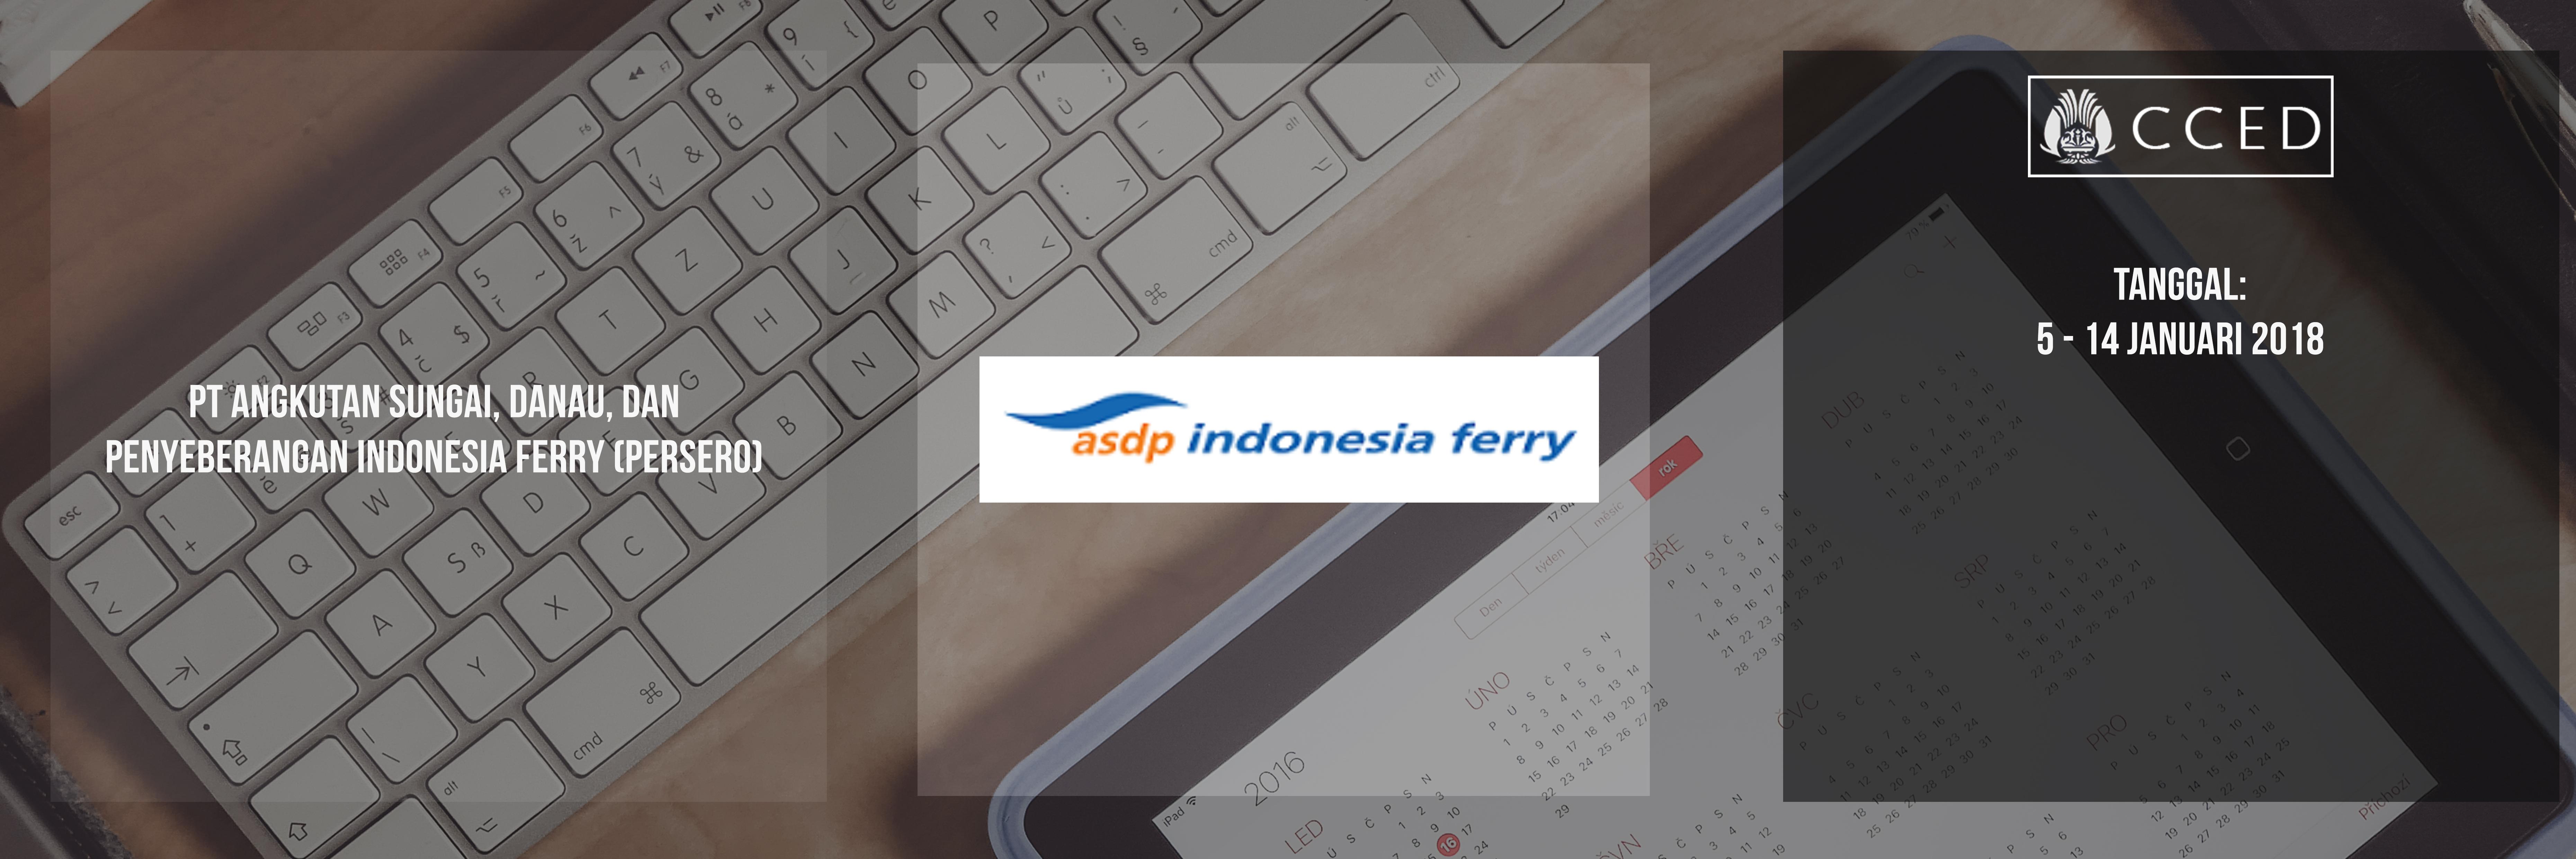 depan-pt-angkutan-sungai-danau-dan-penyeberangan-indonesia-ferry-persero